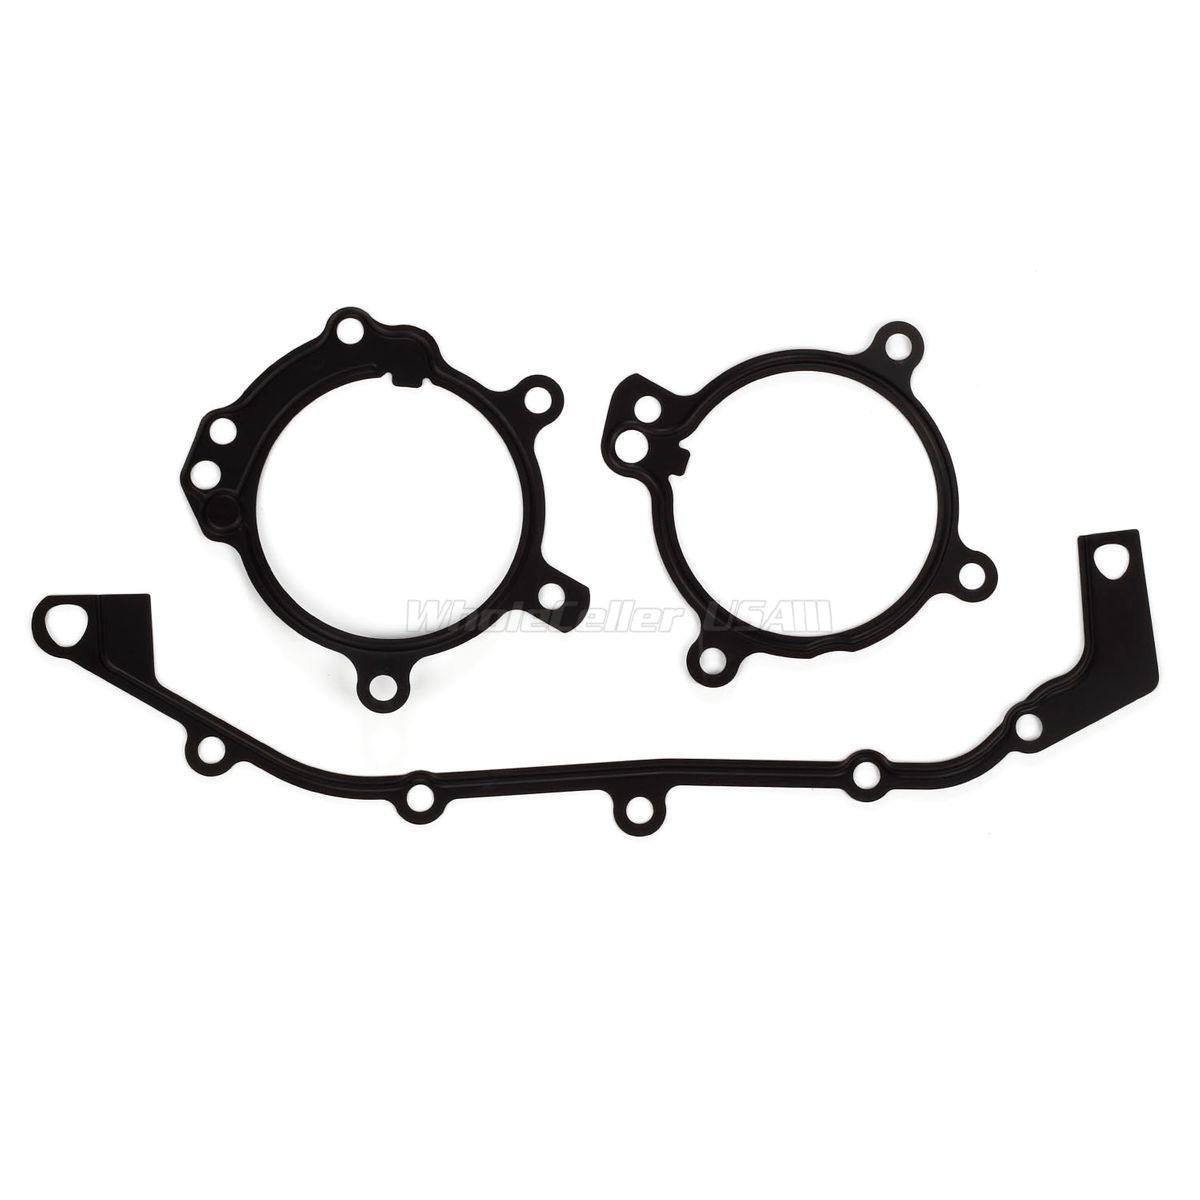 VANOS O-Ring Seal Repair Kit For BMW E36 E39 E46 E53 E60